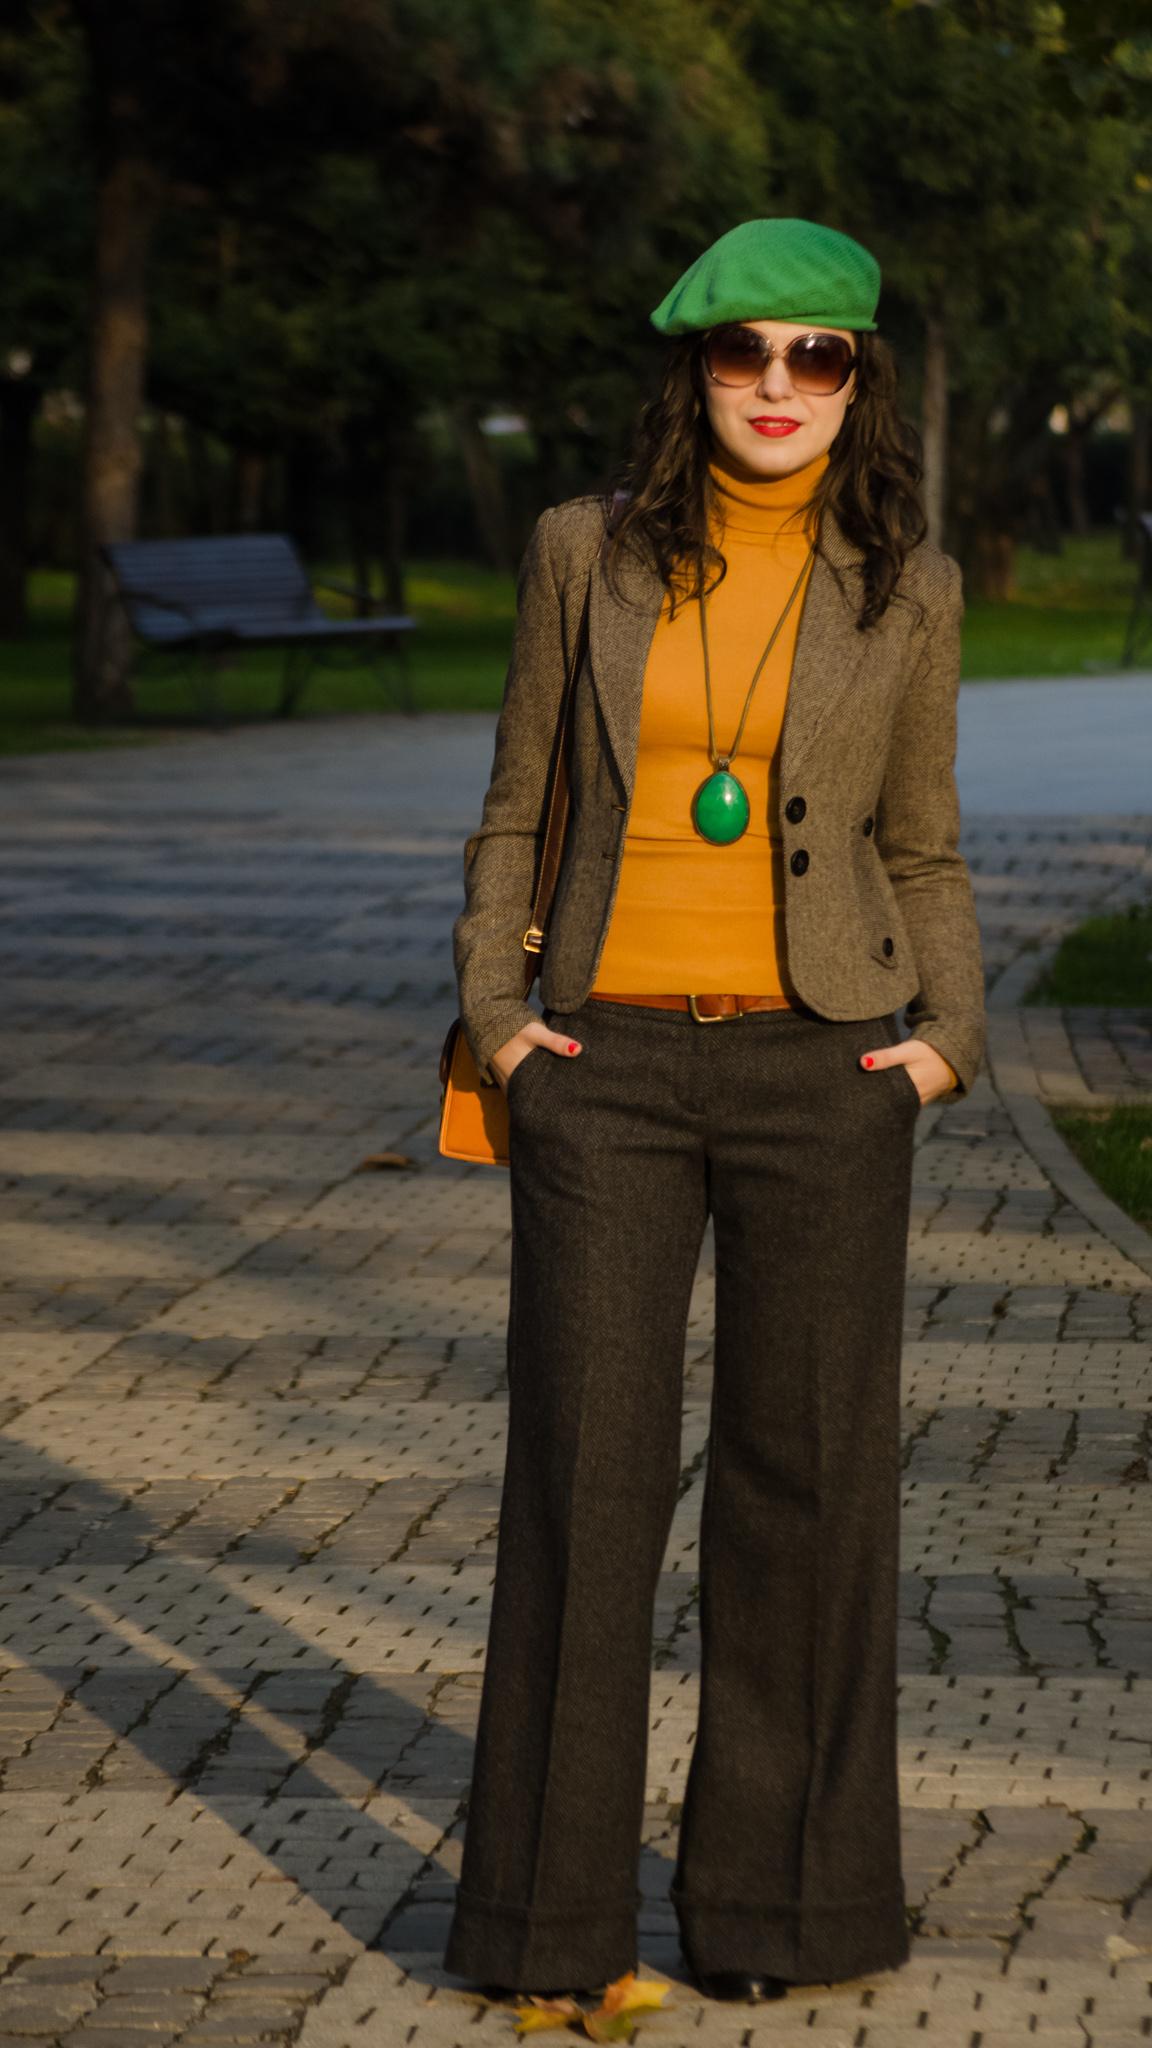 70s flare pants mustard turtleneck brown blazer jacket green beret french promod fall